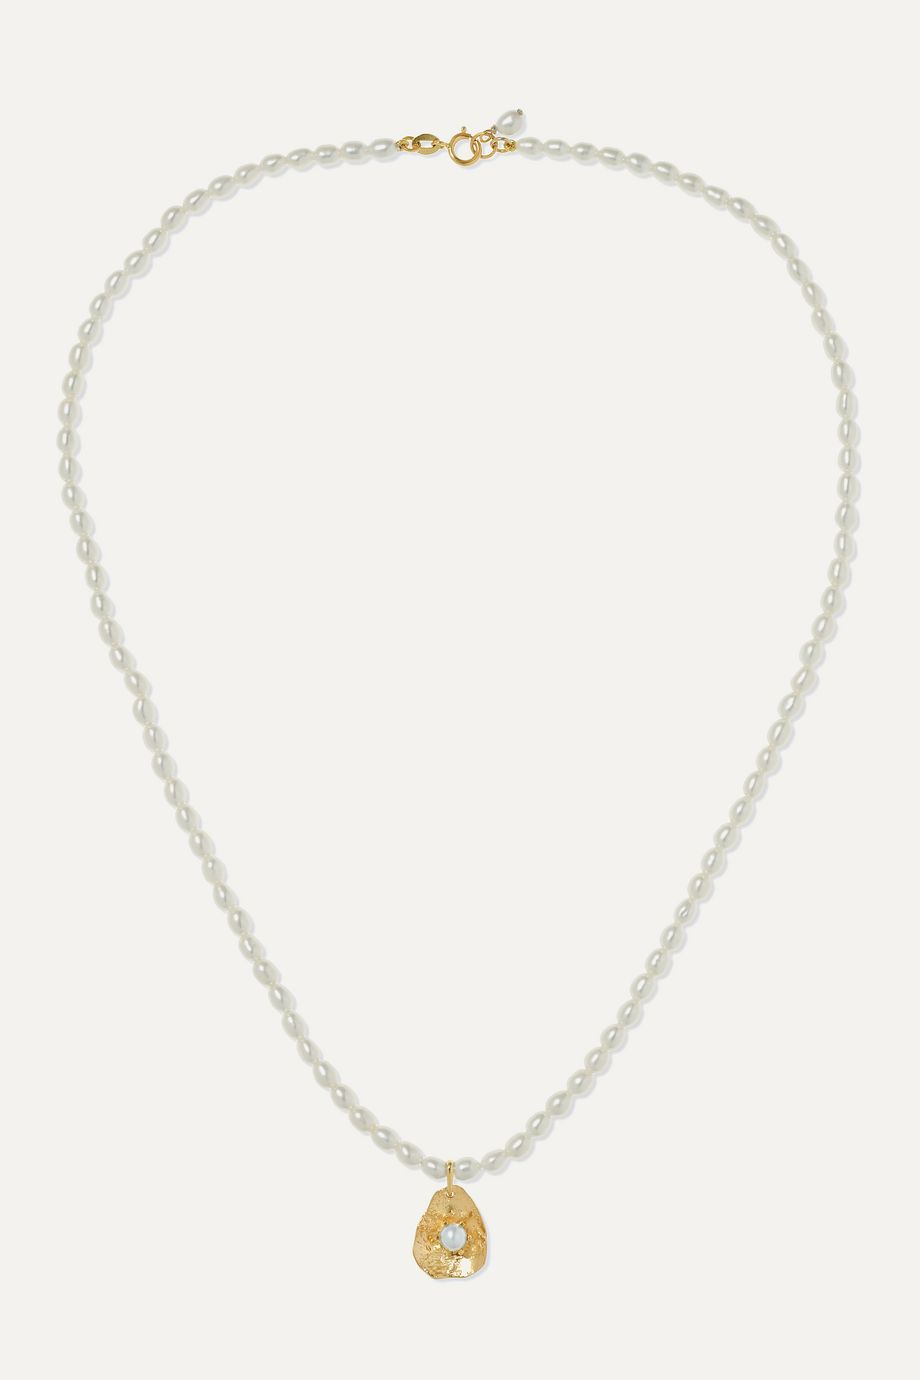 Poppy Finch 14K 黄金珍珠项链